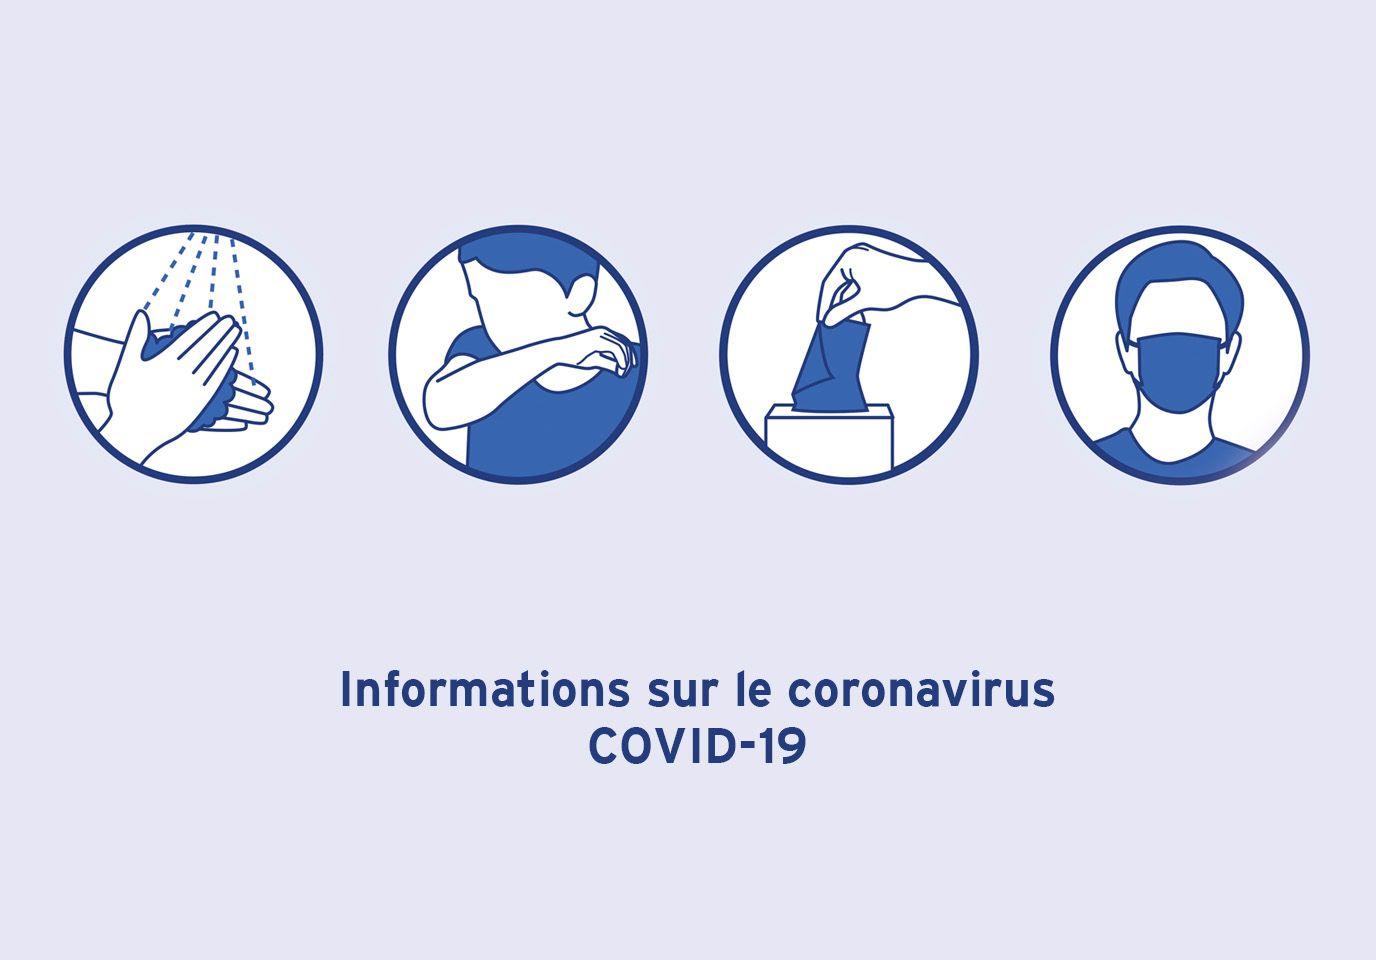 Information geste barrière COVID